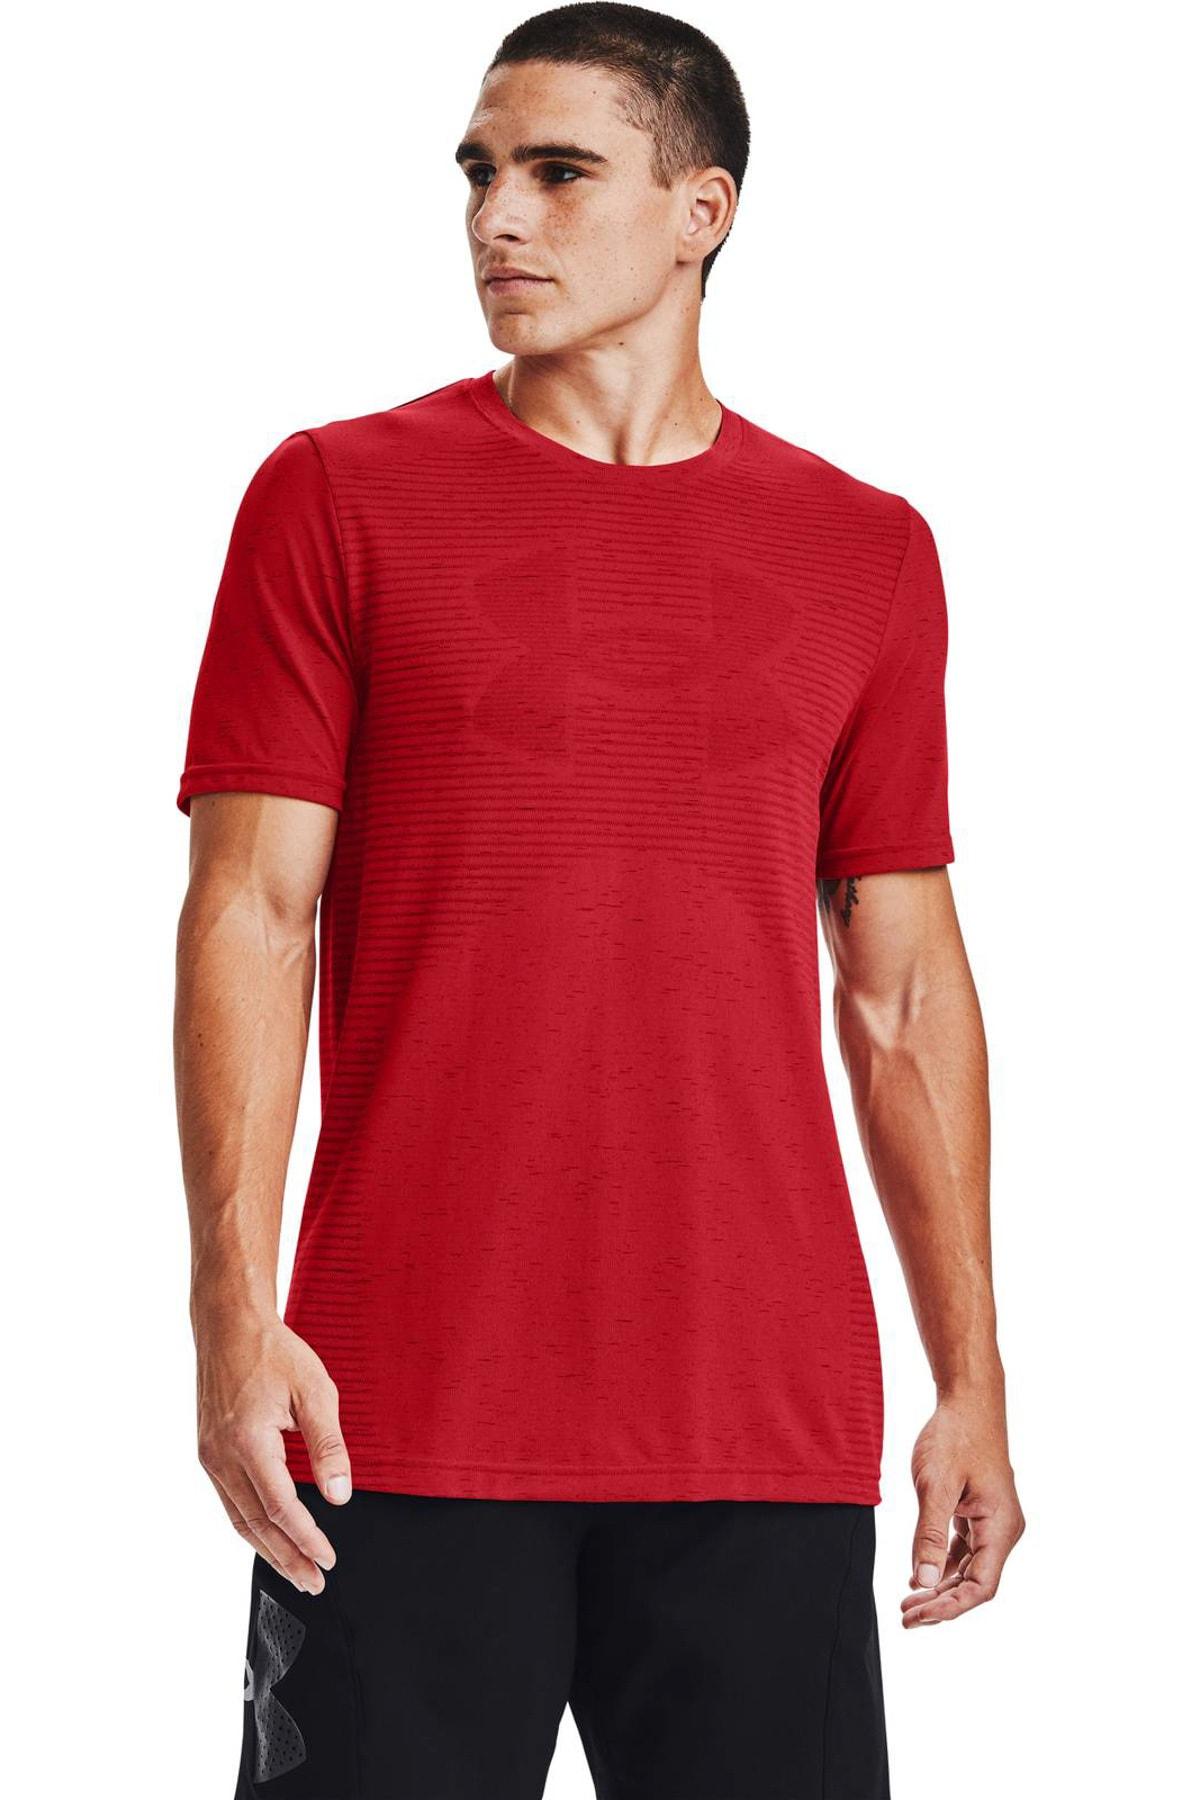 Under Armour Erkek Spor T-Shirt - Ua Seamless Logo Ss - 1356798-608 1